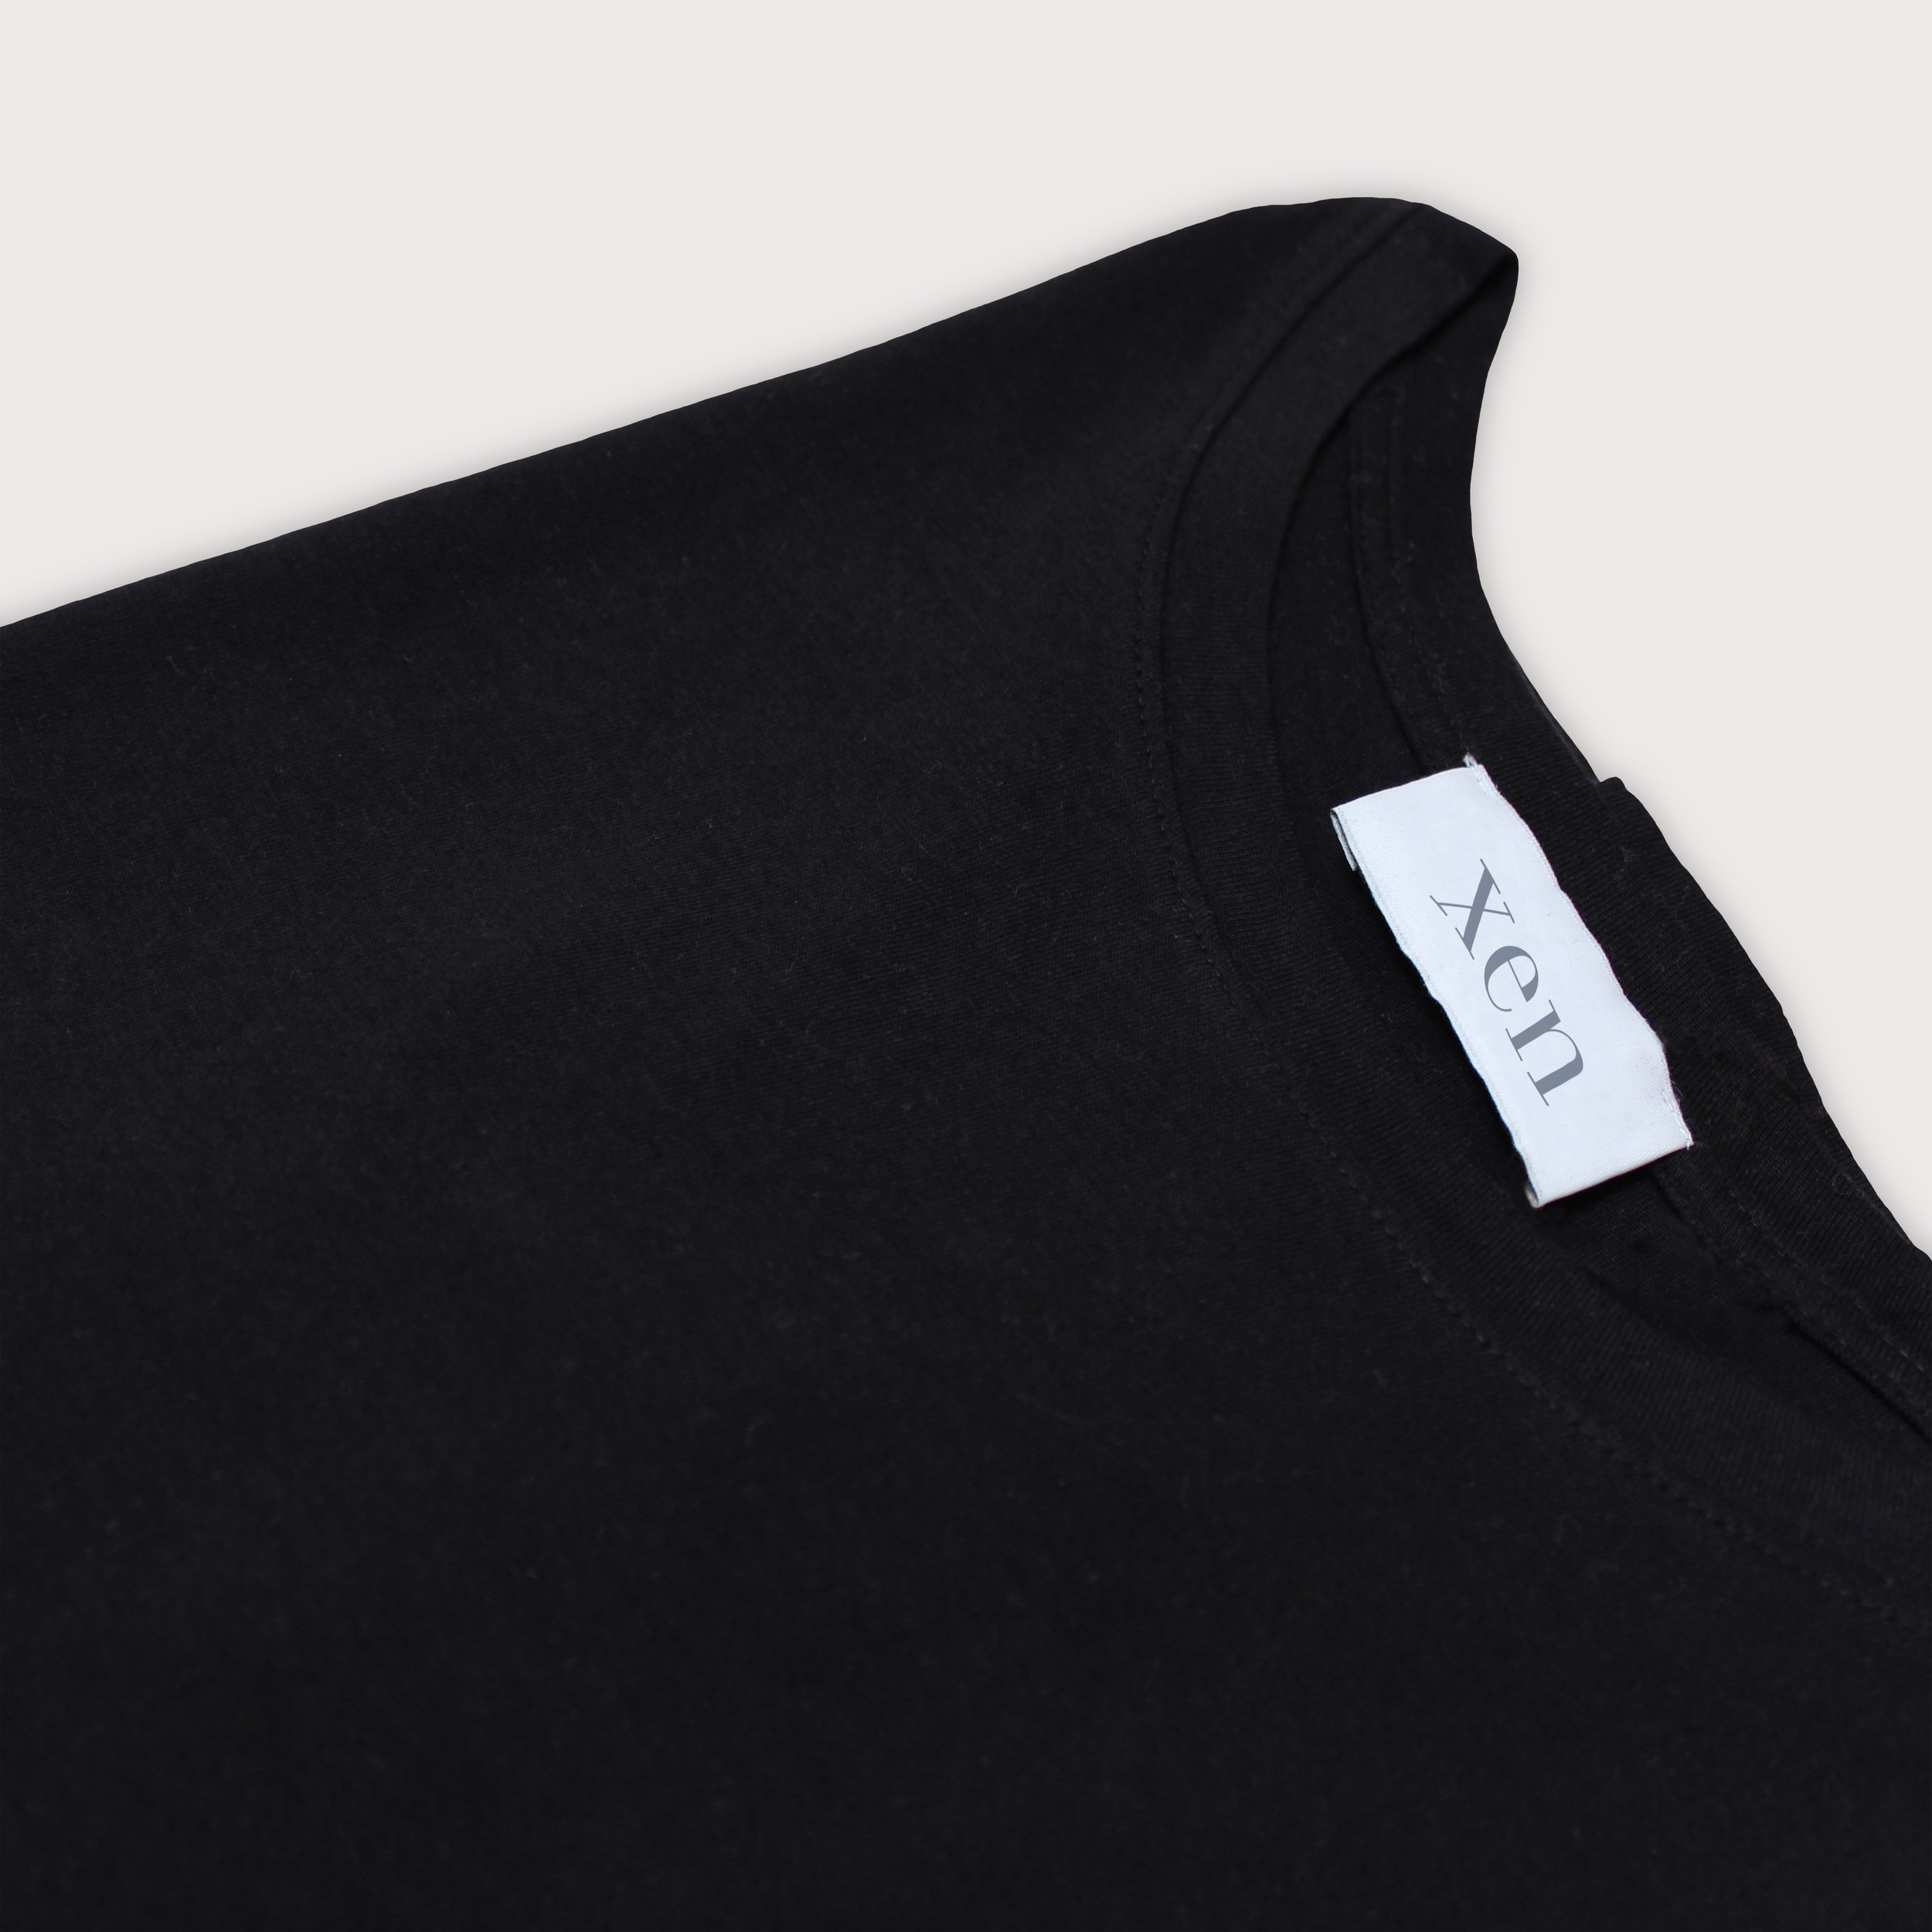 YDRAY-mockup-label.jpg